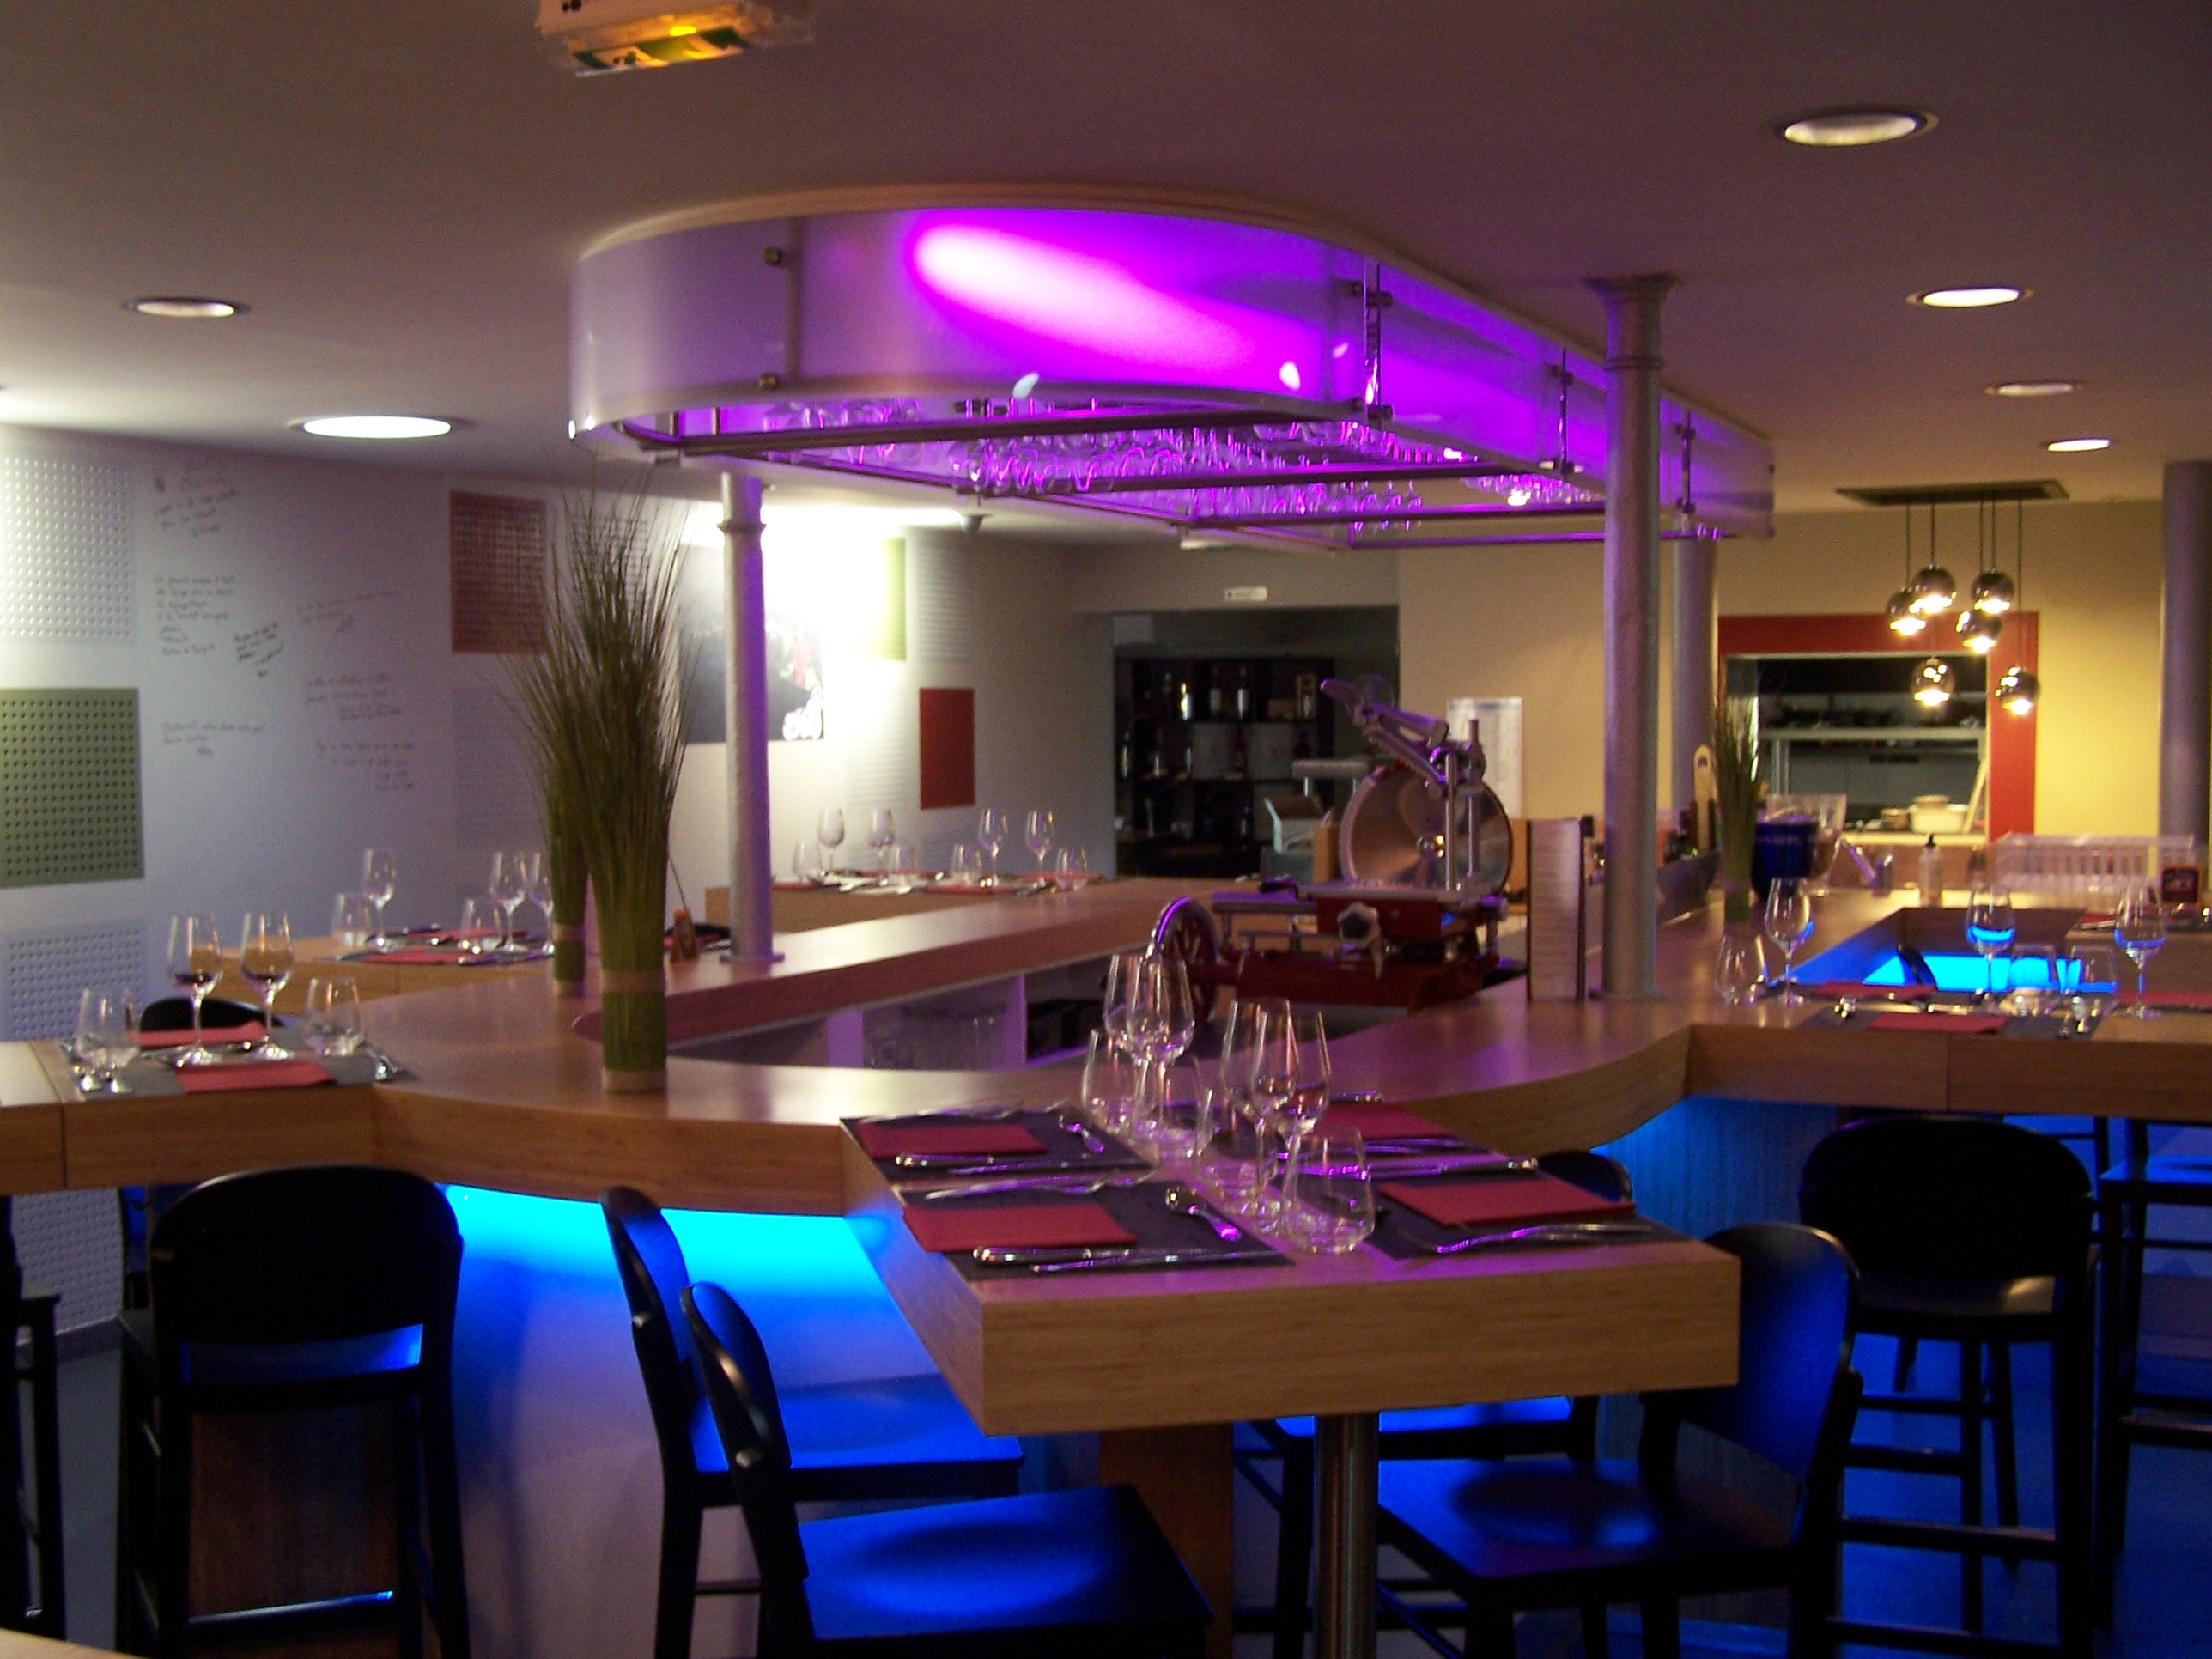 Restaurant charleville m zi res guide restaurants - Restaurant la table d arthur charleville ...